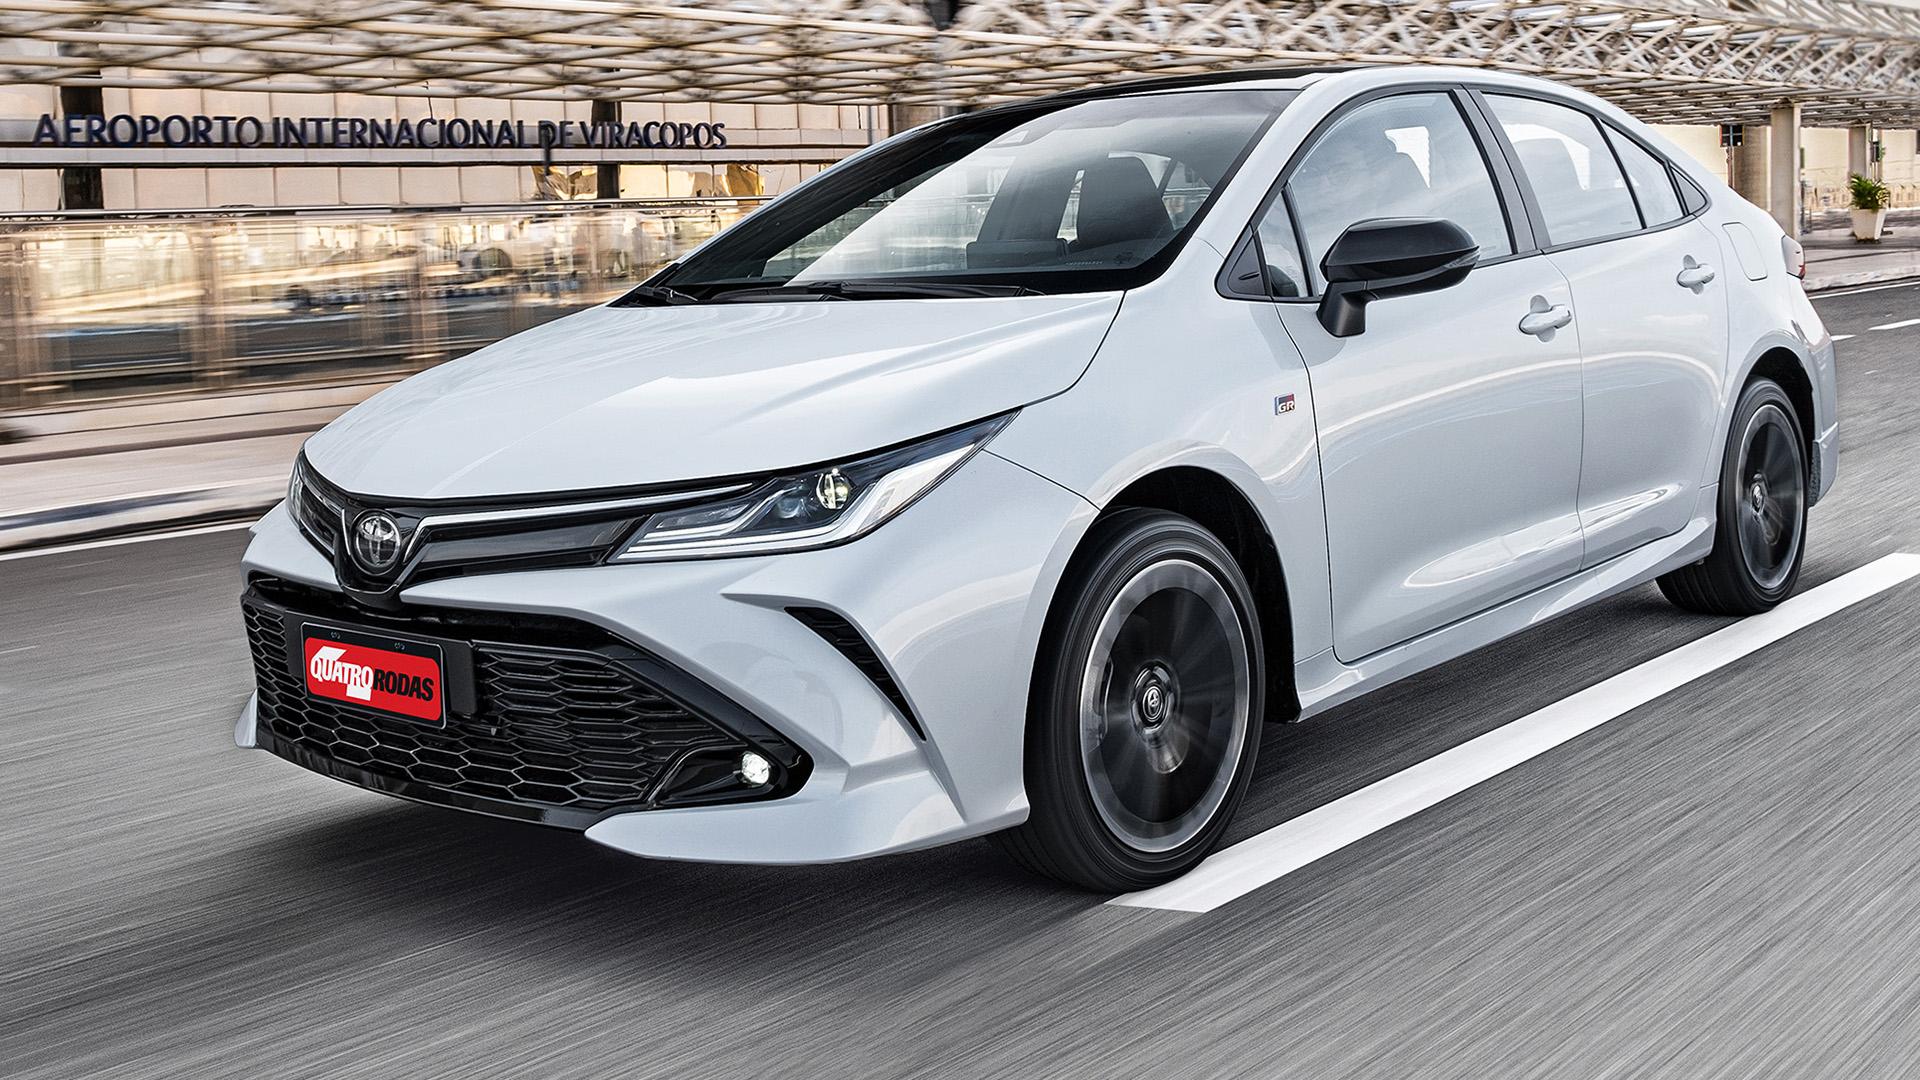 Toyota Corolla perde Android Auto e Carplay por falta de semicondutores